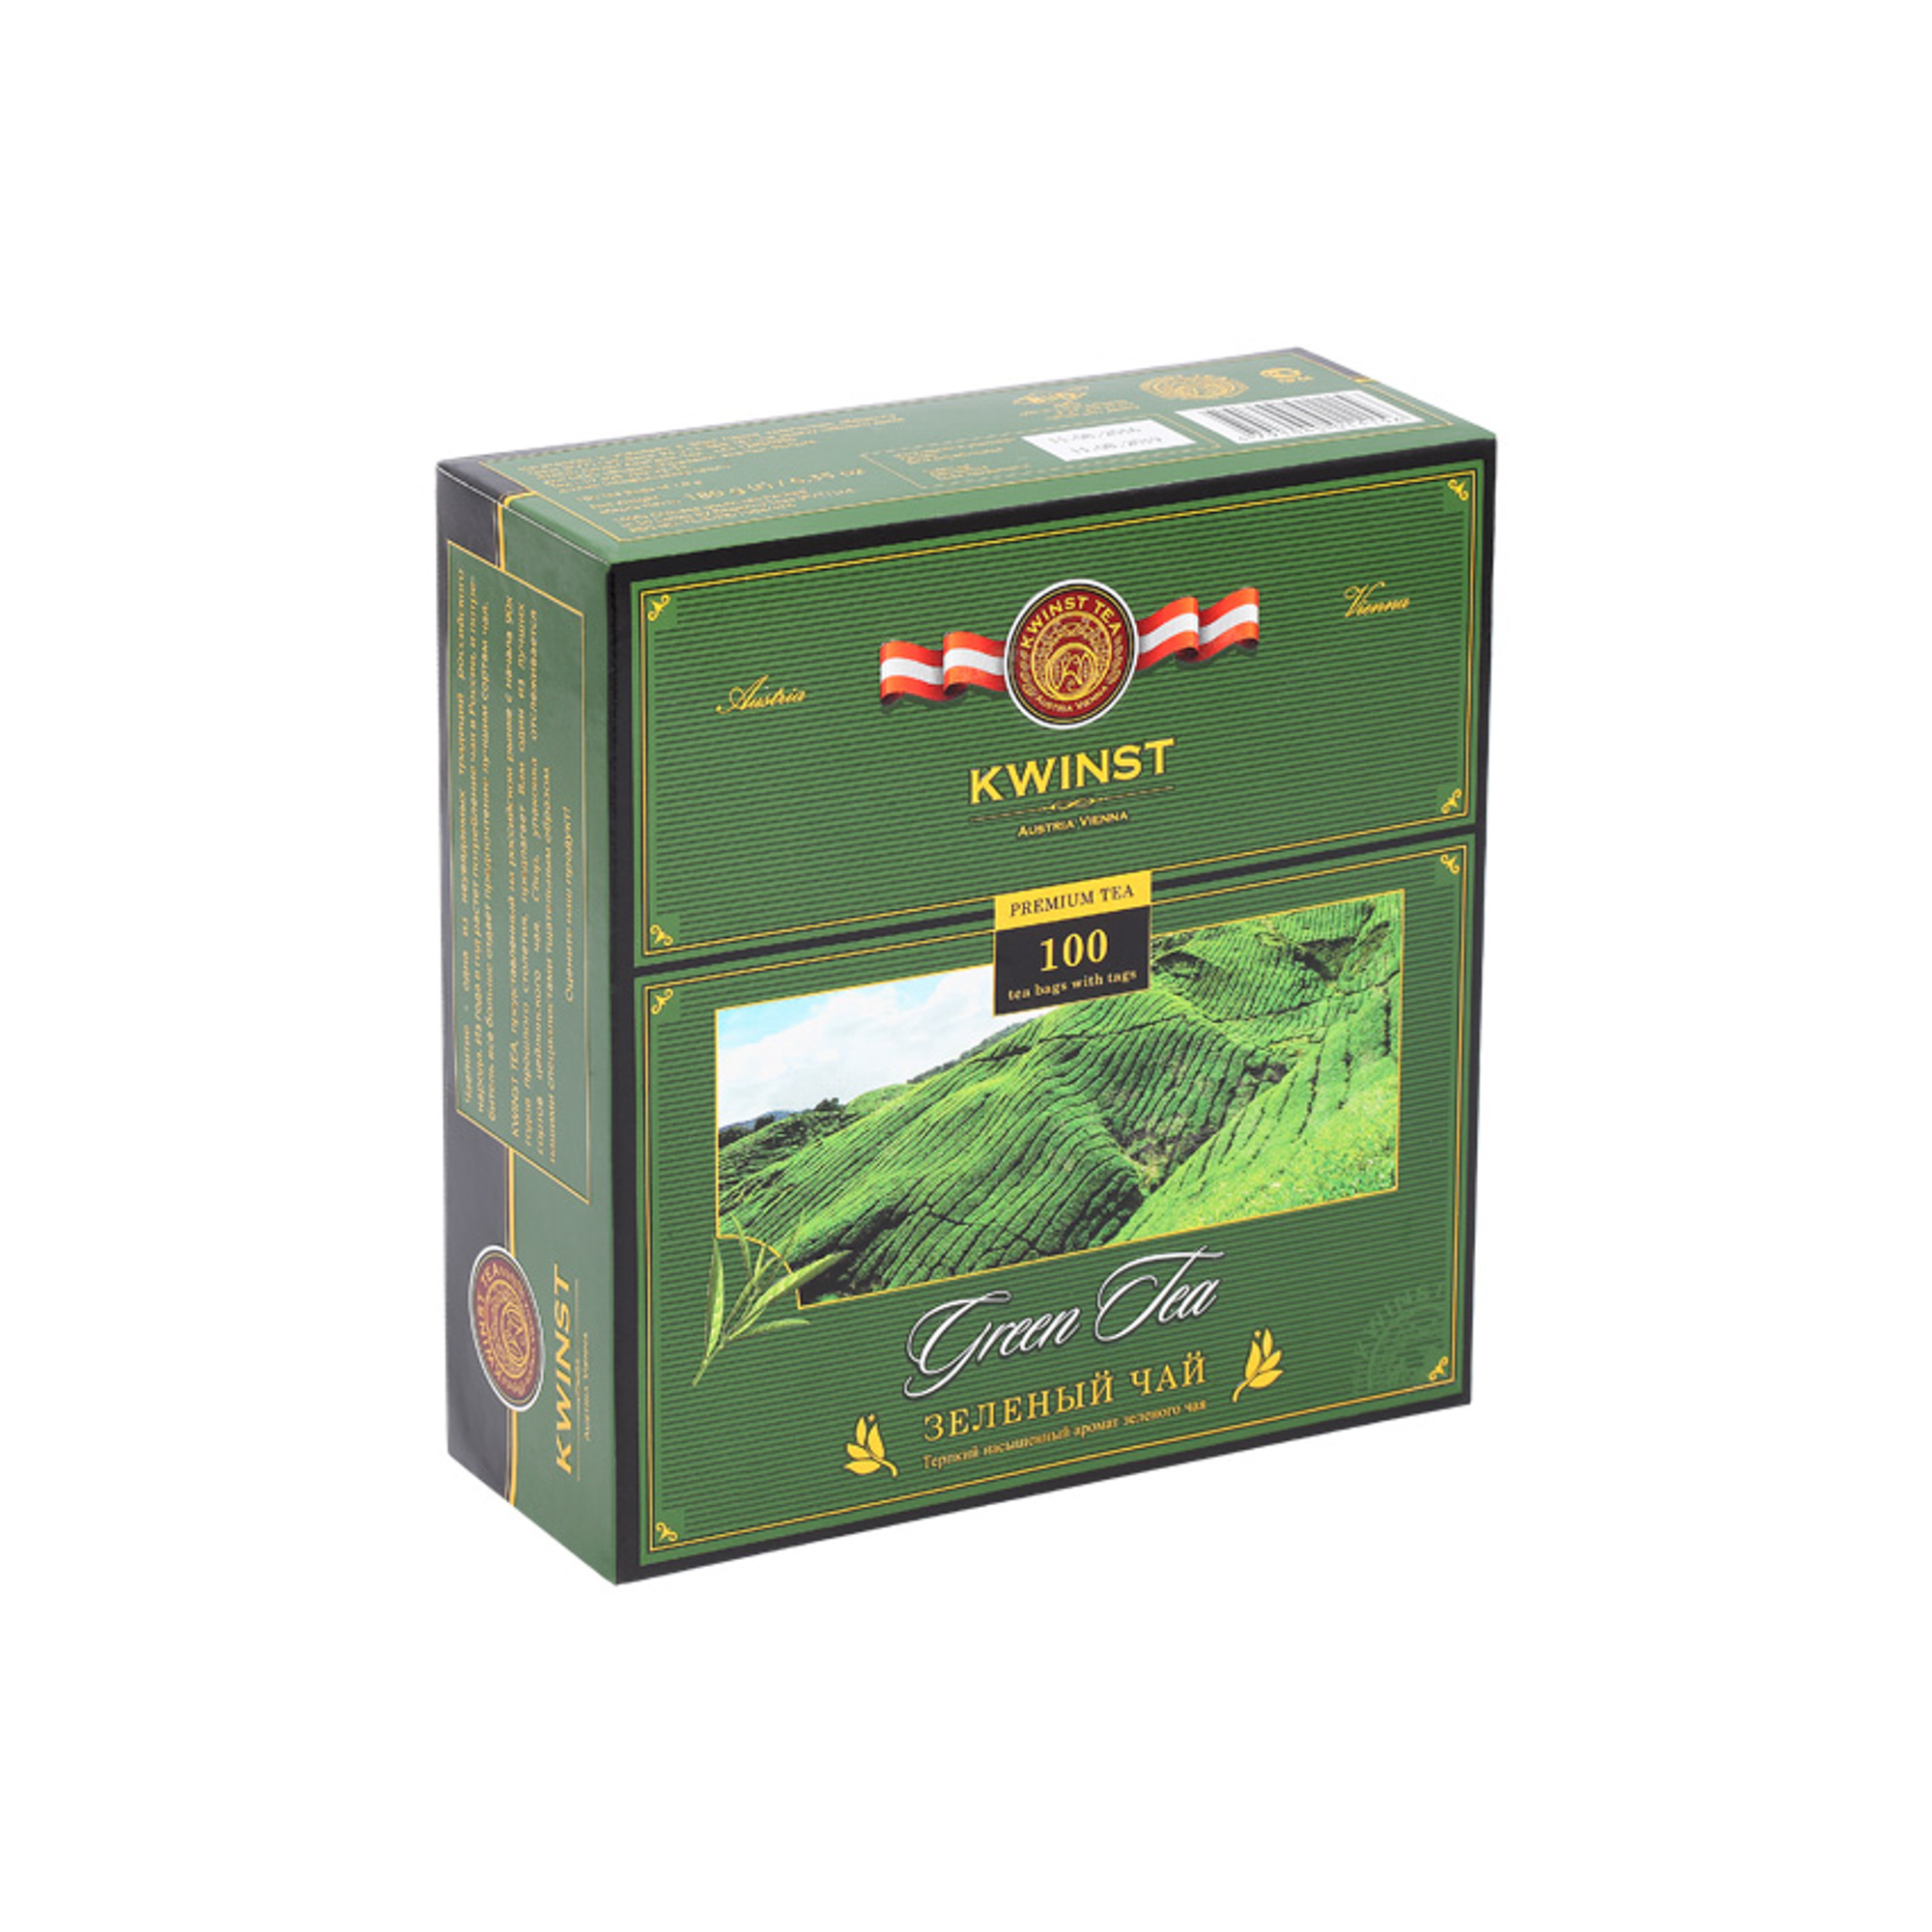 Чай зеленый Kwinst китайский 100 пакетиков чай зеленый kwinst китайский 100 пакетиков